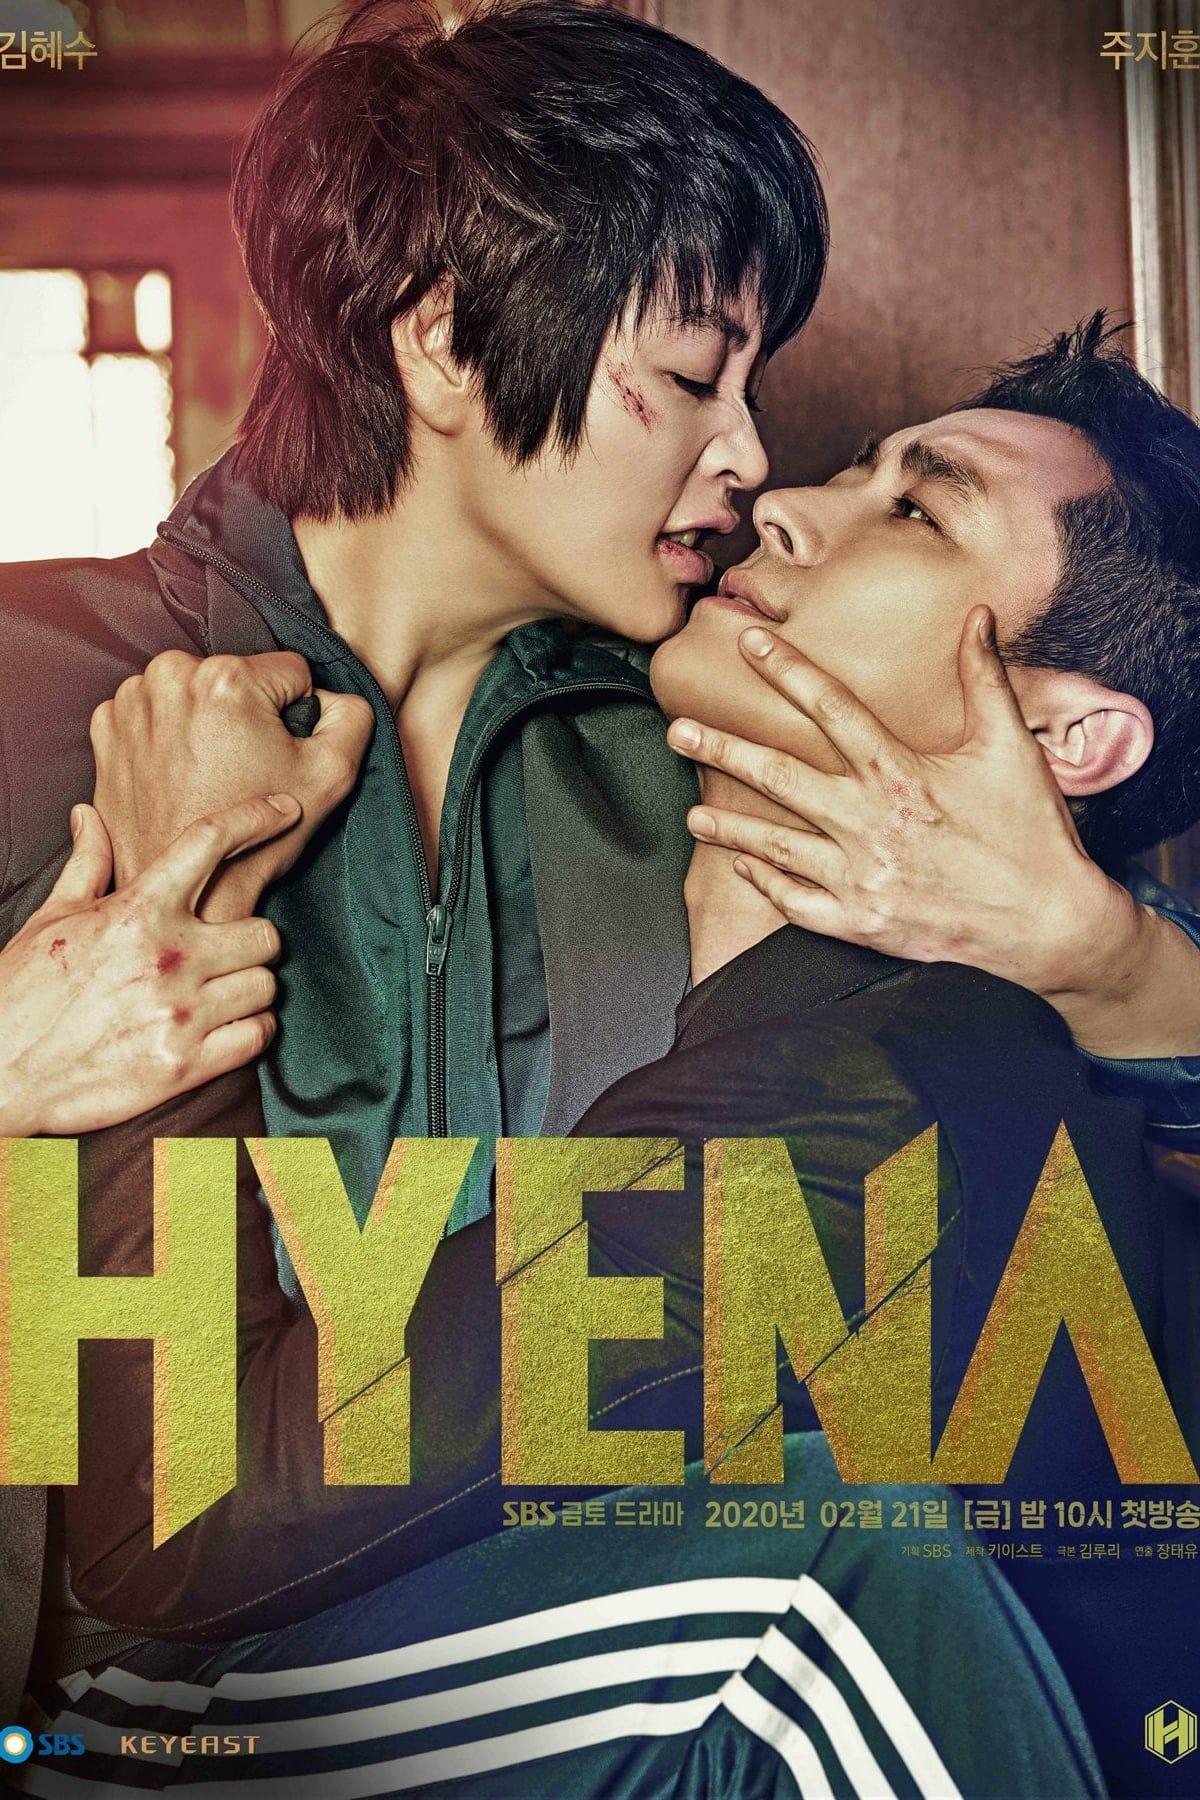 Watch Online Korean Drama New SBS Hyena (2020) Full